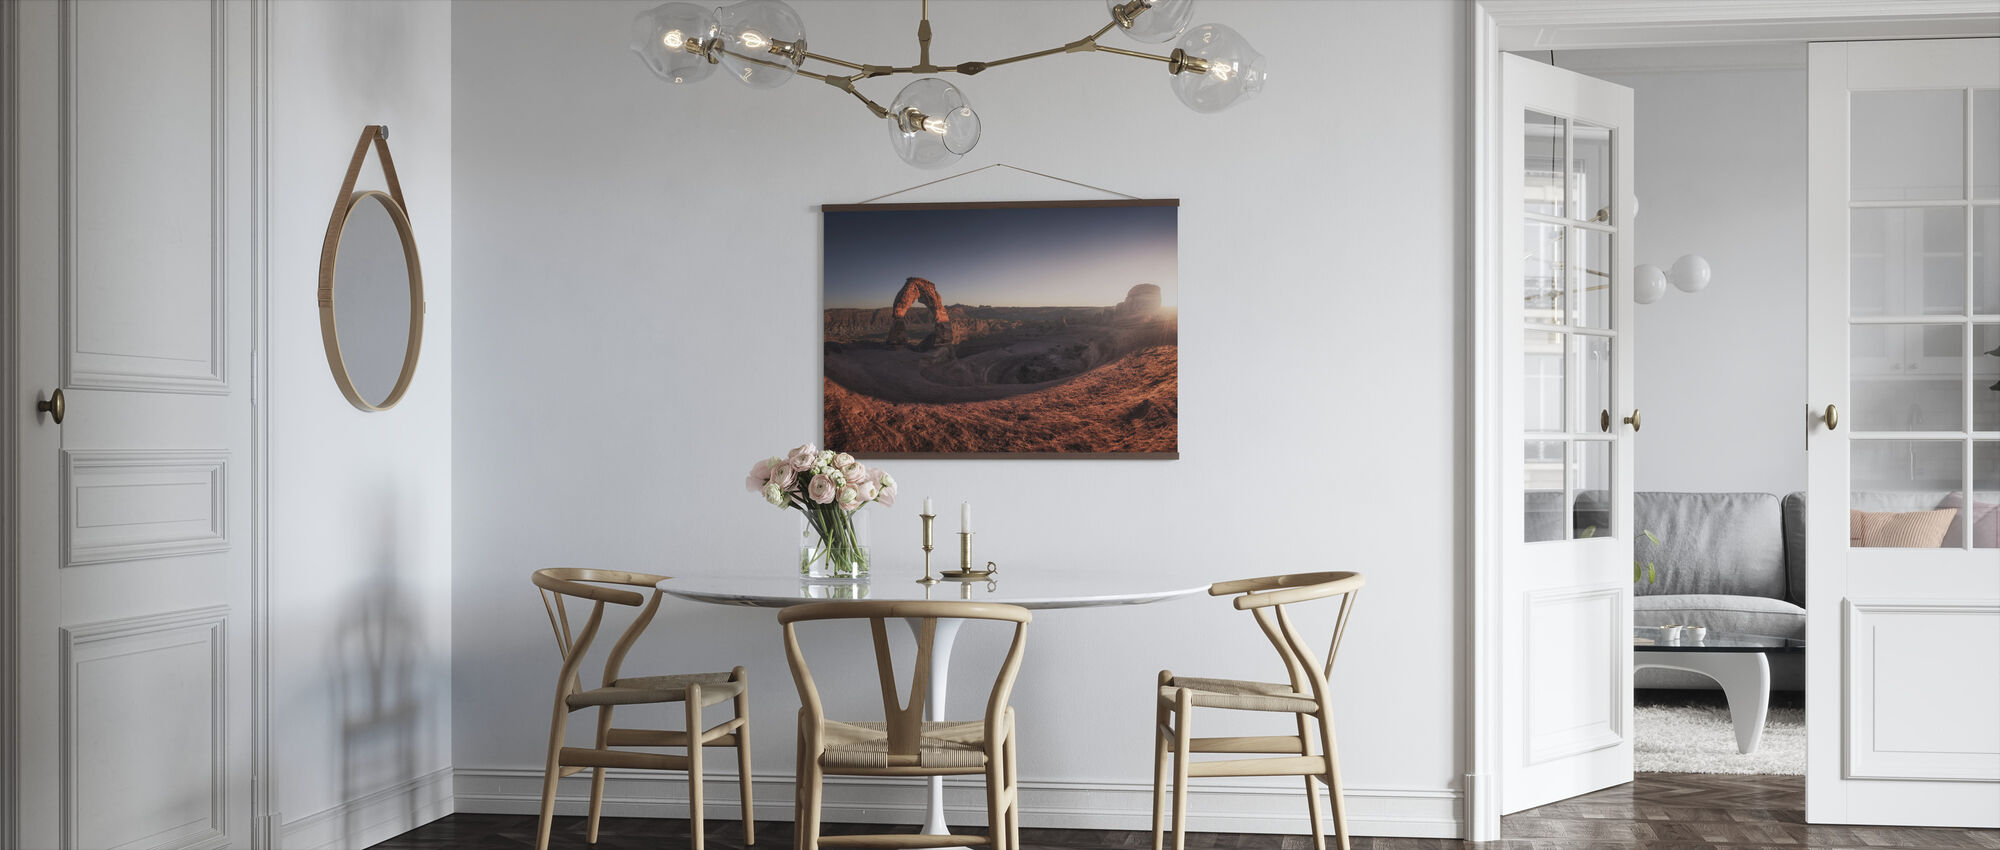 Delicate Light - Poster - Kitchen